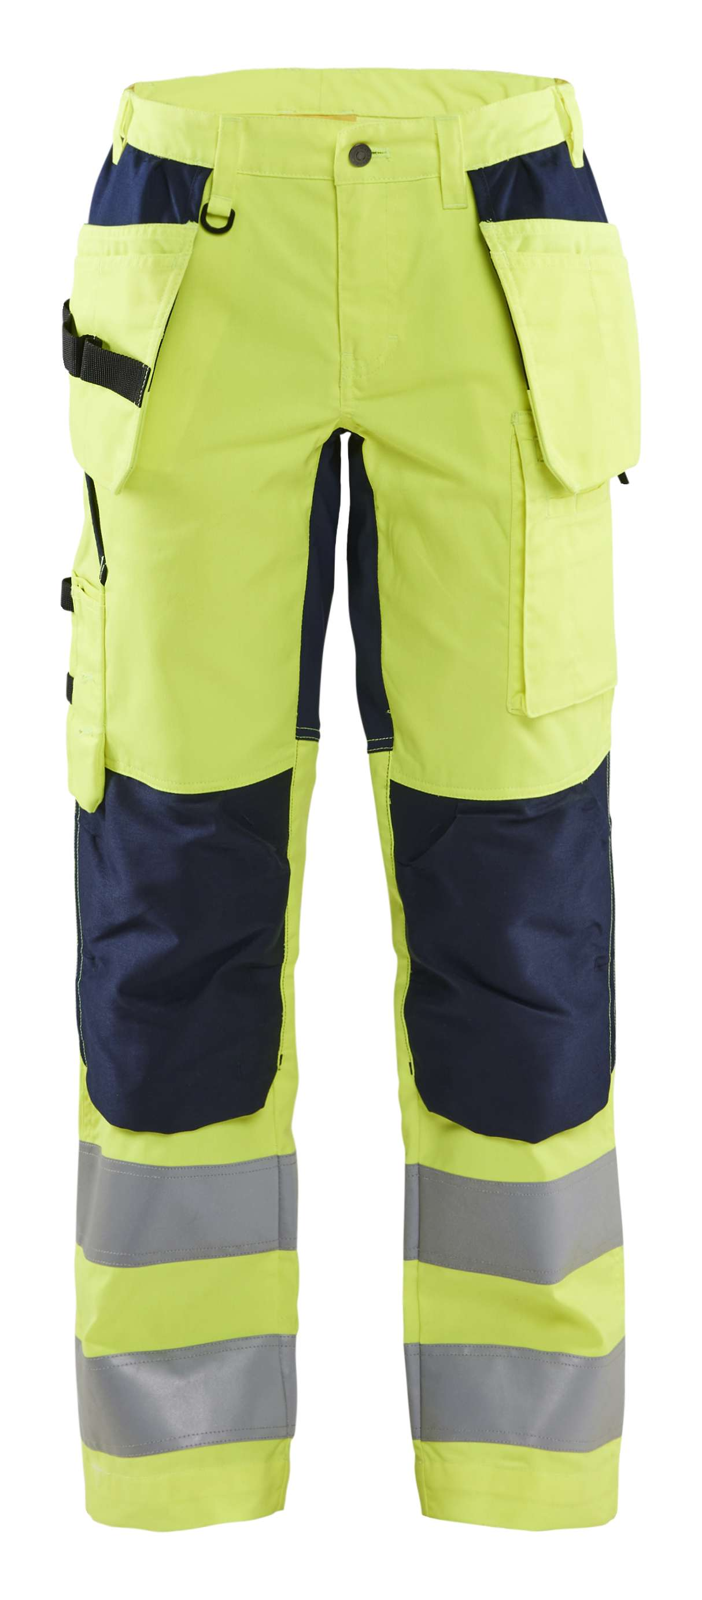 Blaklader Dames werkbroeken 71631811 High Vis fluo geel-marineblauw(3389)